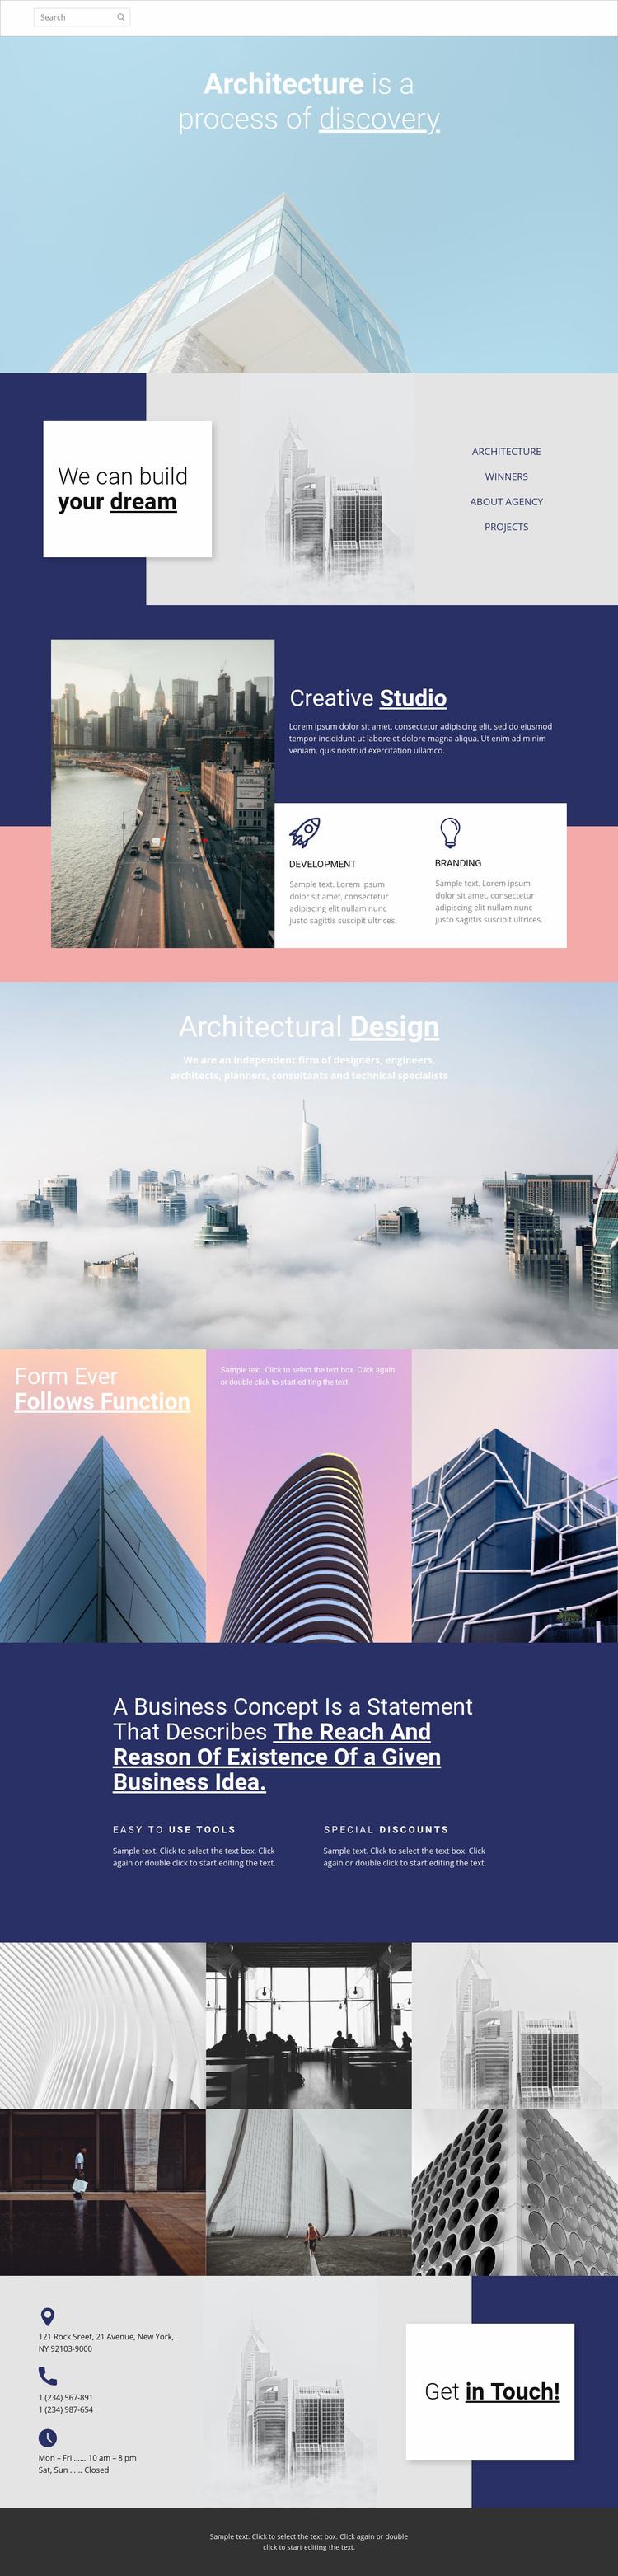 Wonders of architecture Web Page Designer